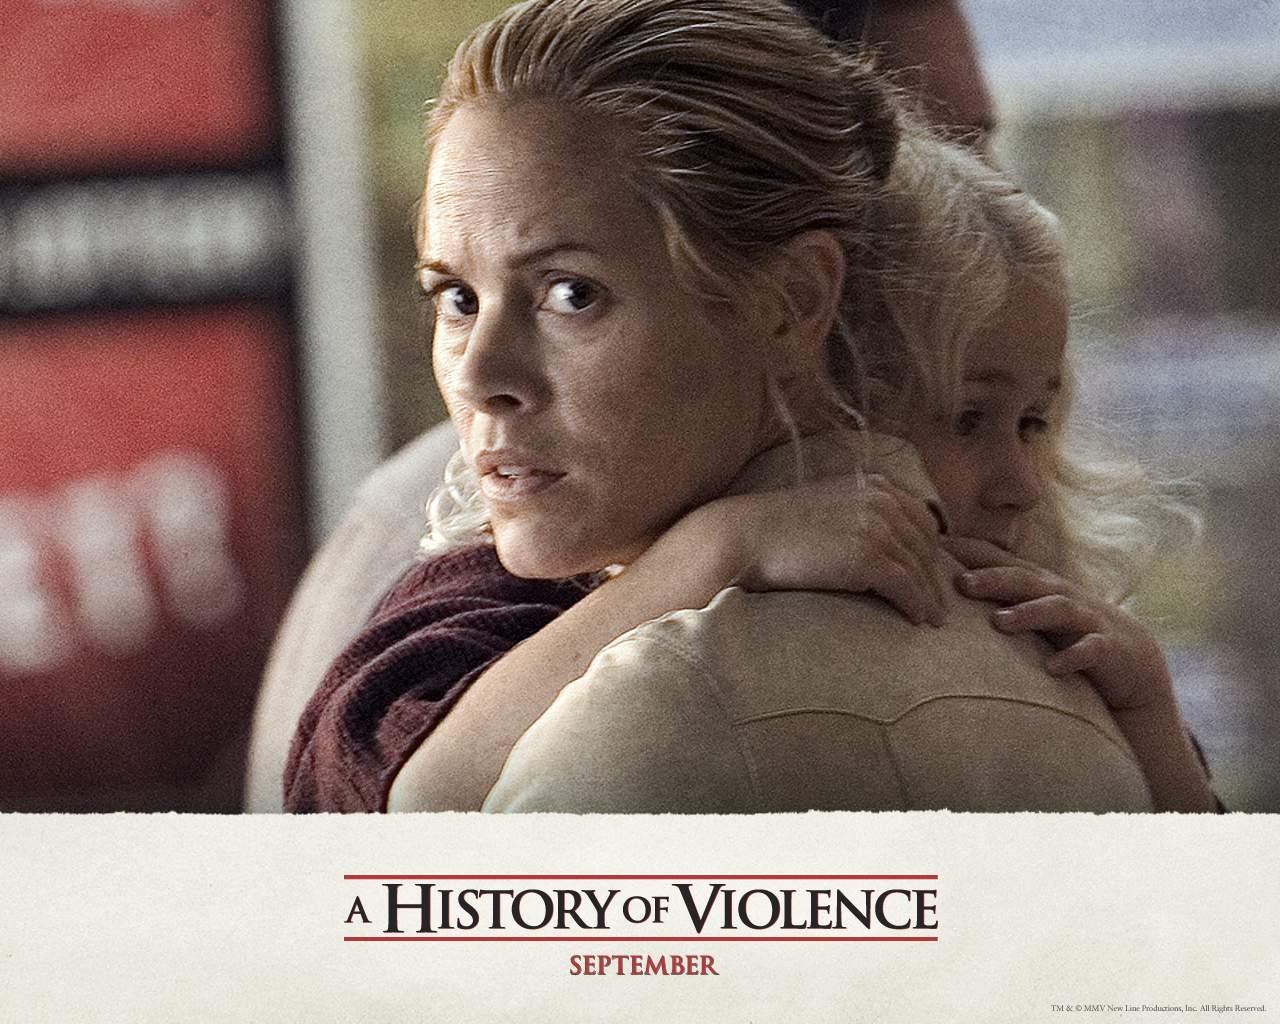 http://2.bp.blogspot.com/-pRJqgkbKUvk/TguNJSqzIeI/AAAAAAAAAr8/NTNMOZPxnBs/s1600/A+History+of+Violence+-+Movie+Wallpaper+-+02.jpg